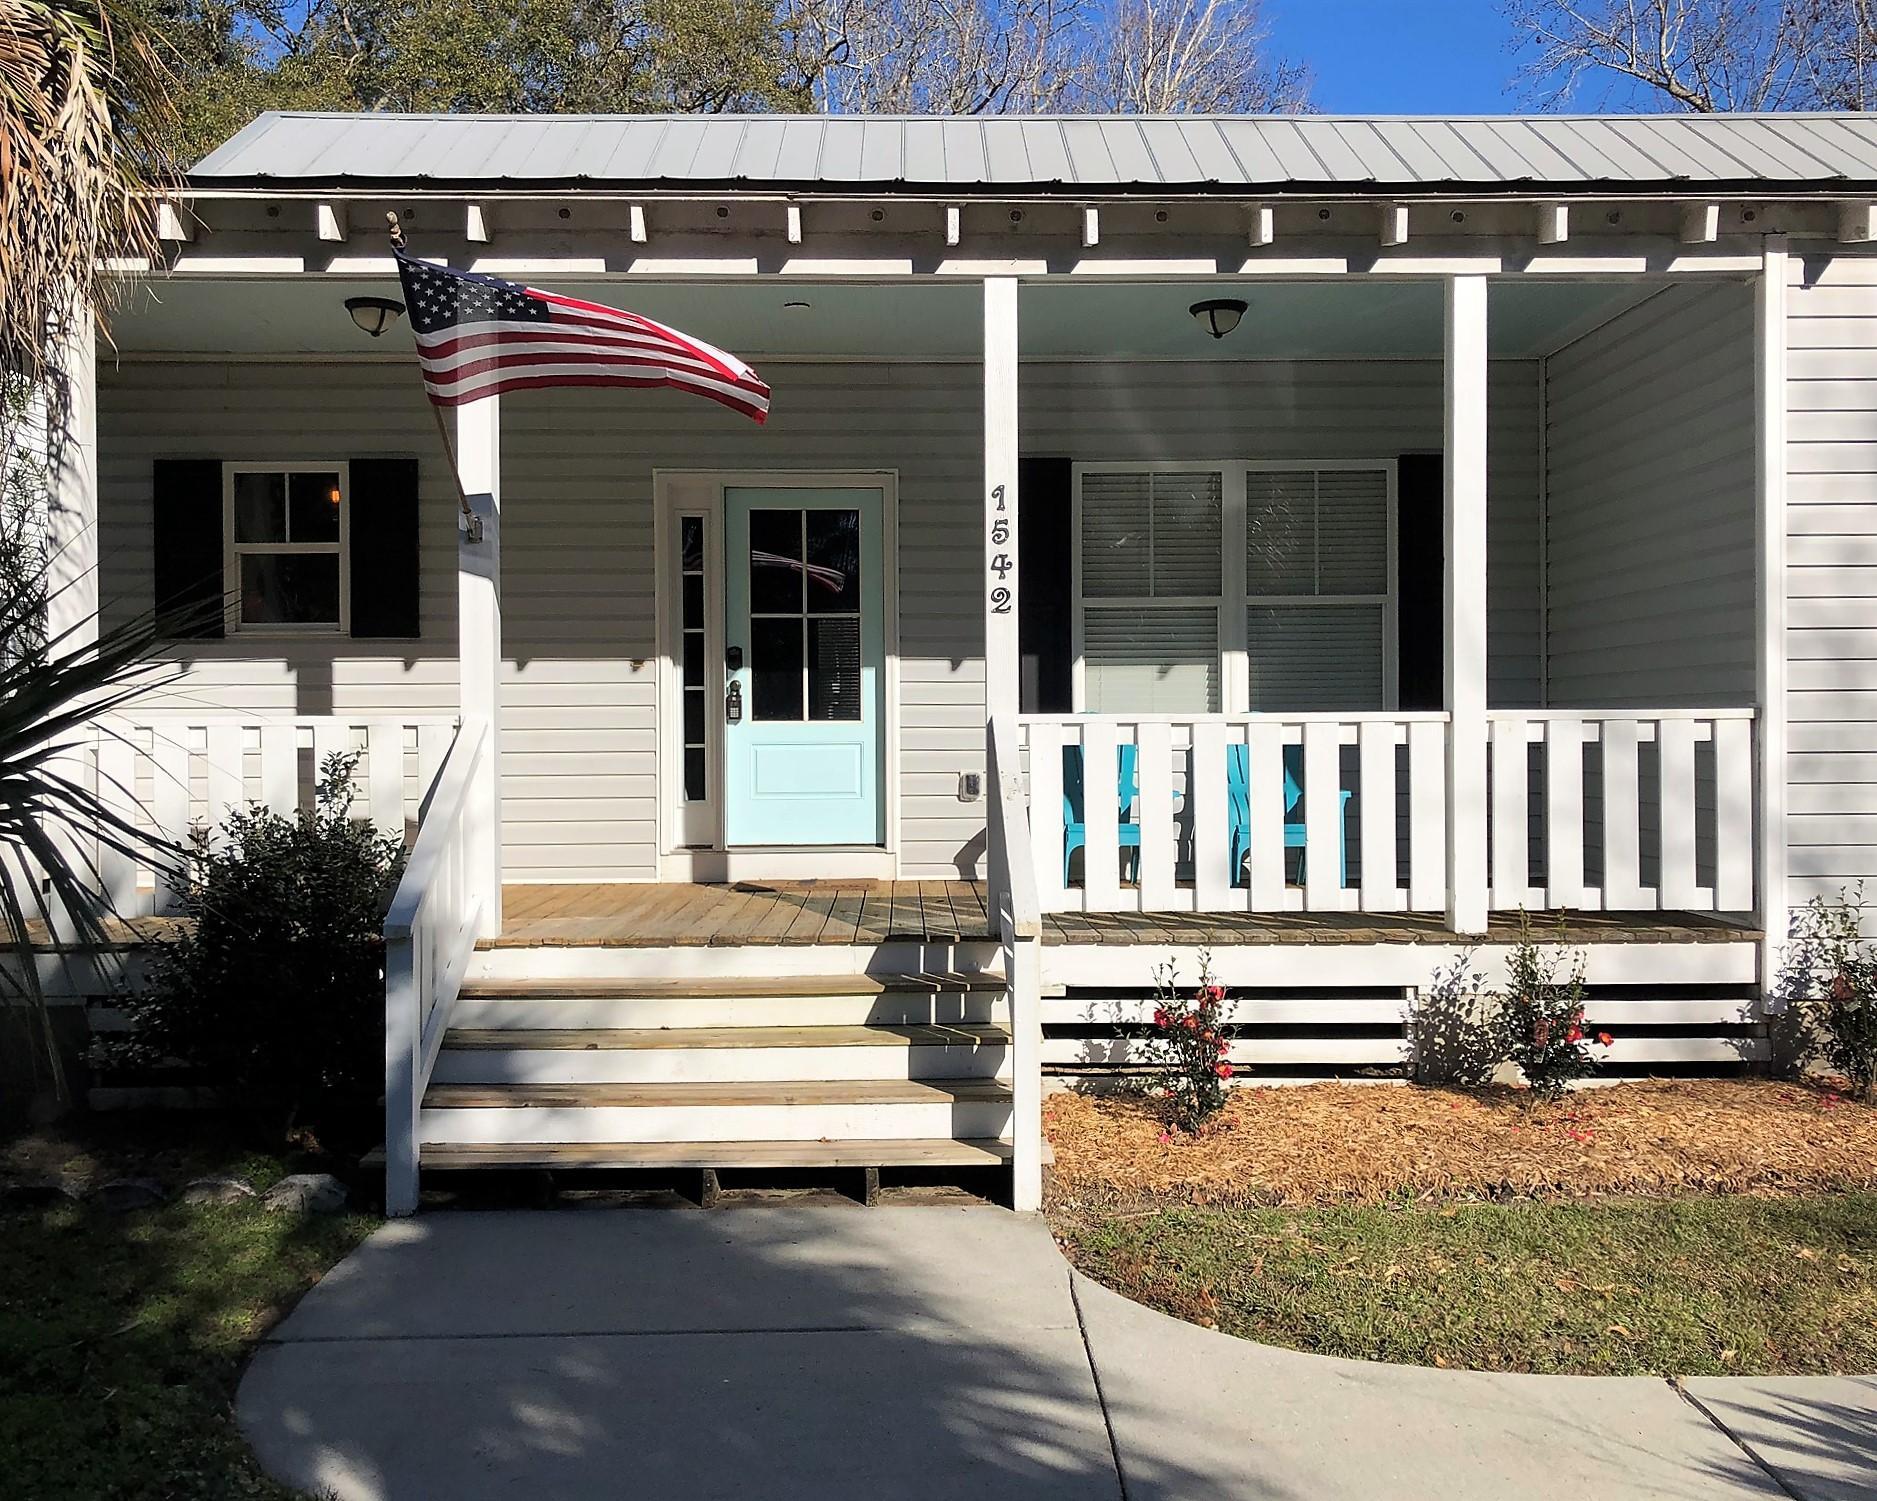 Fairway Villas Homes For Sale - 1542 Little Rock, Charleston, SC - 1